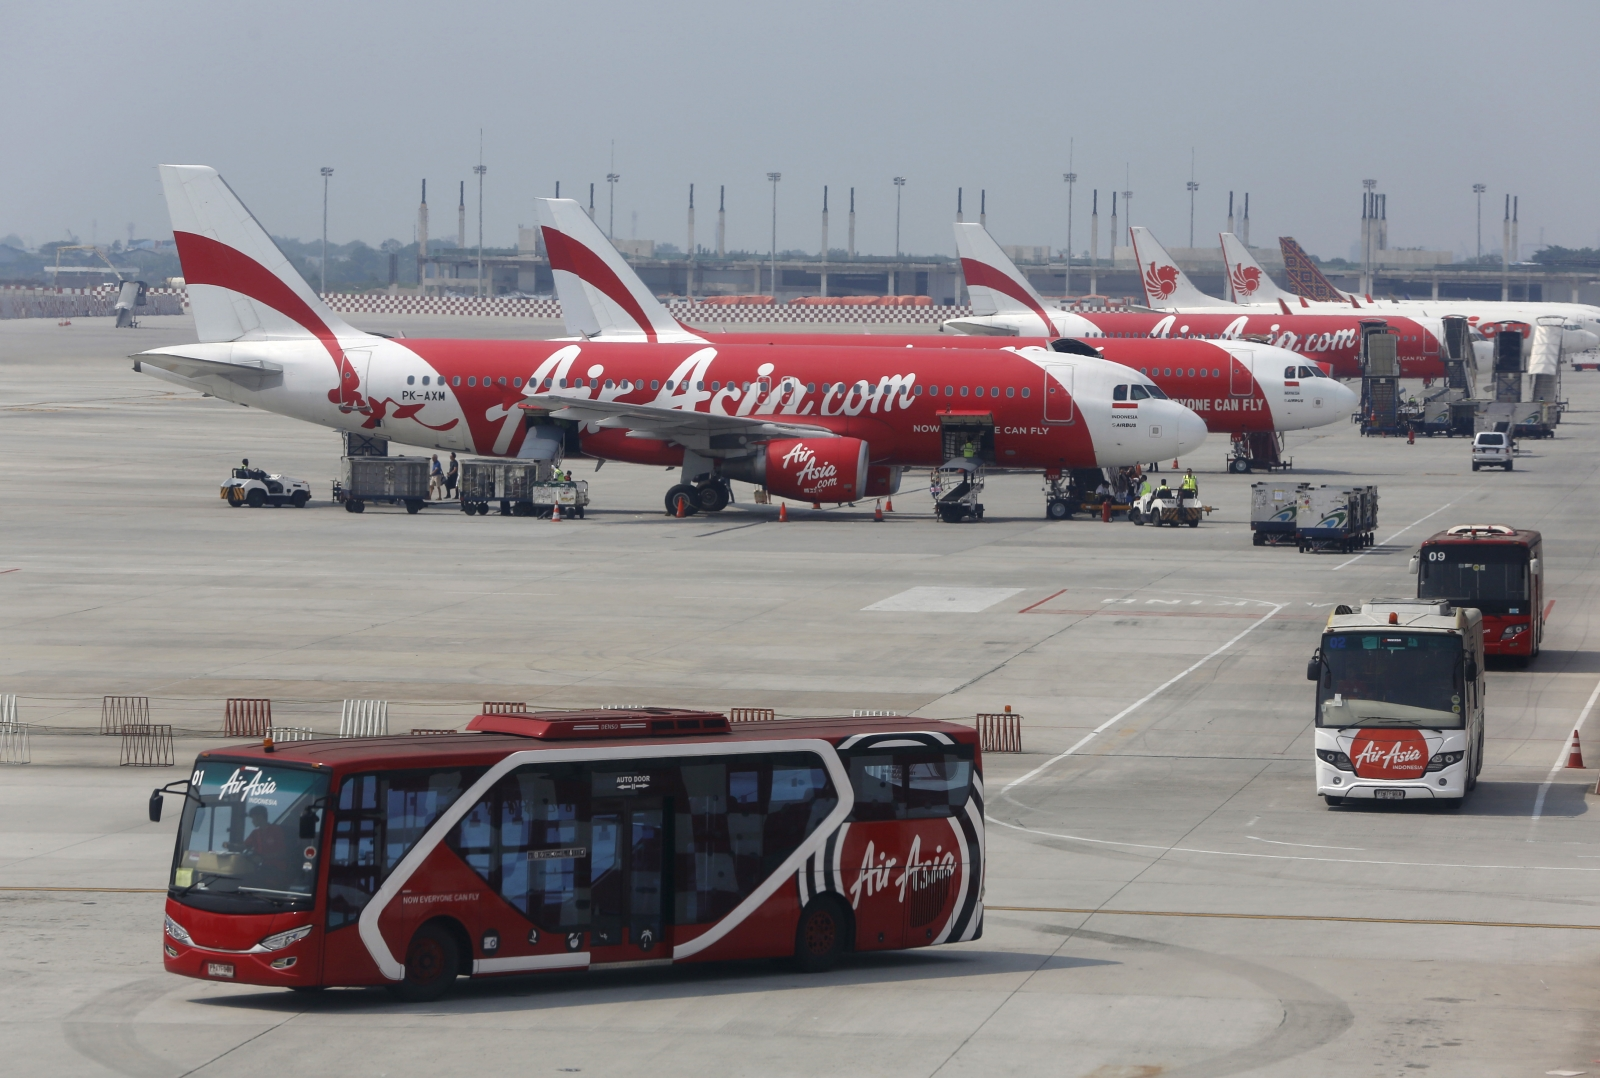 Farnborough Airshow: Airbus could win $12.57bn order from AirAsia